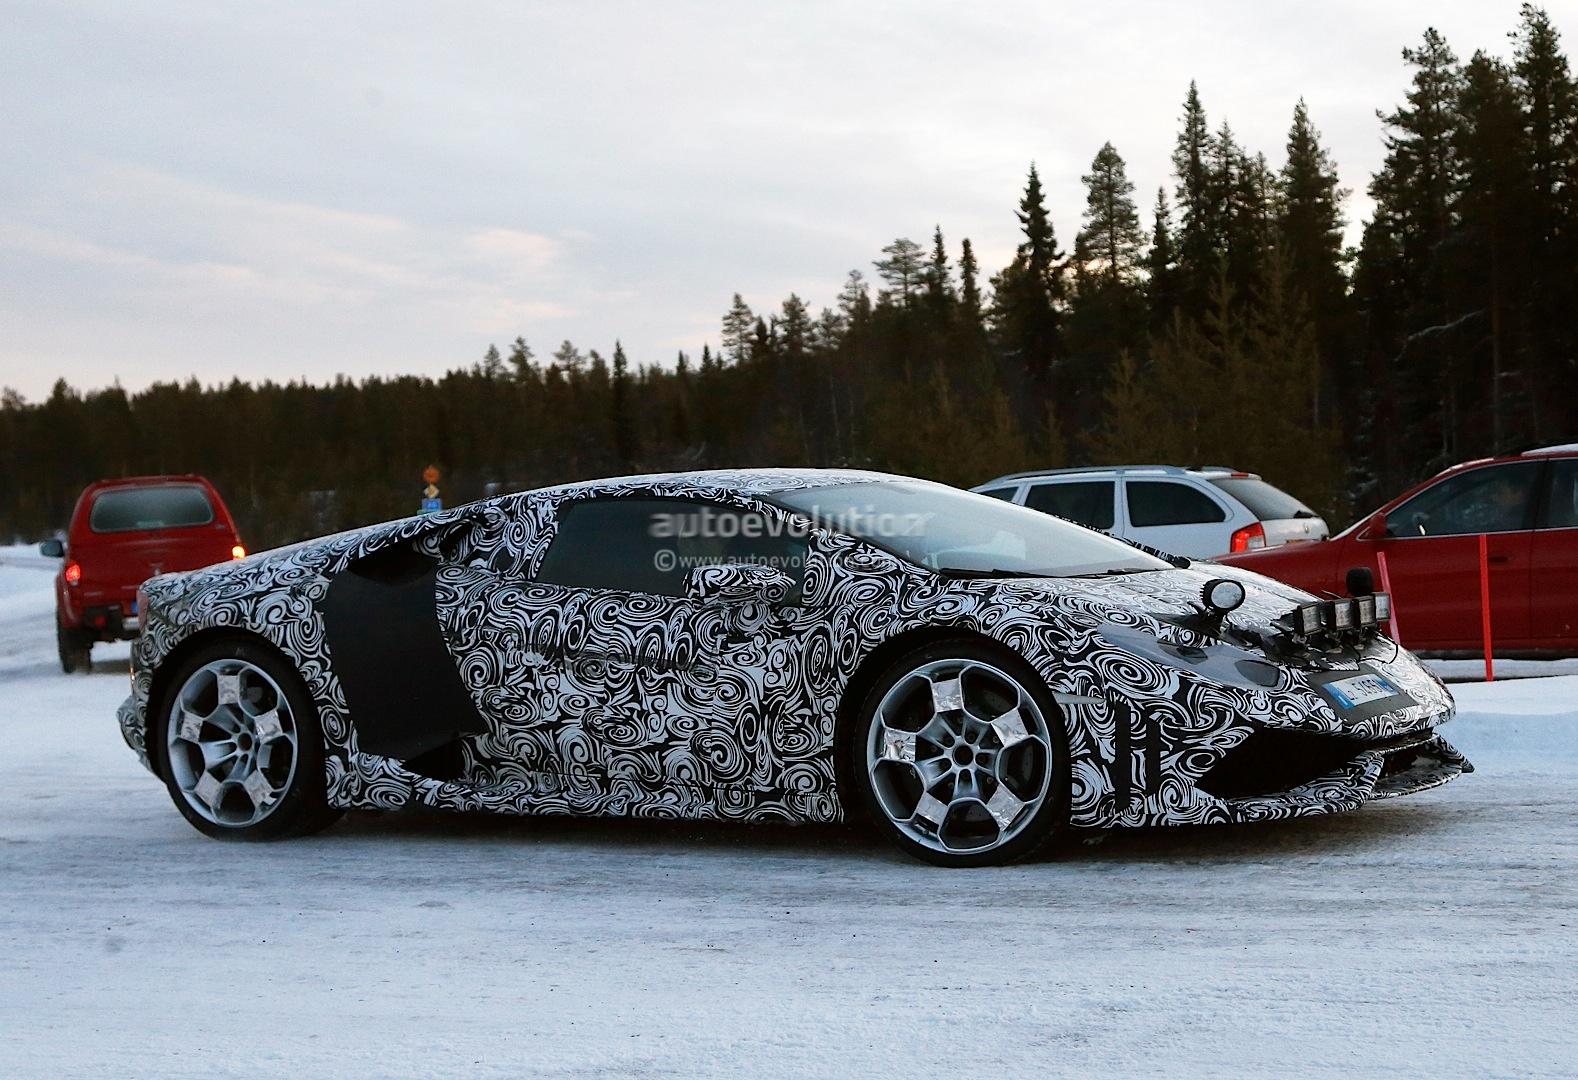 2013 - [Lamborghini] Huracán LP610-4  - Page 4 Lamborghini-huracan-gallardo-successor-begins-winter-testing-photo-gallery-1080p-4